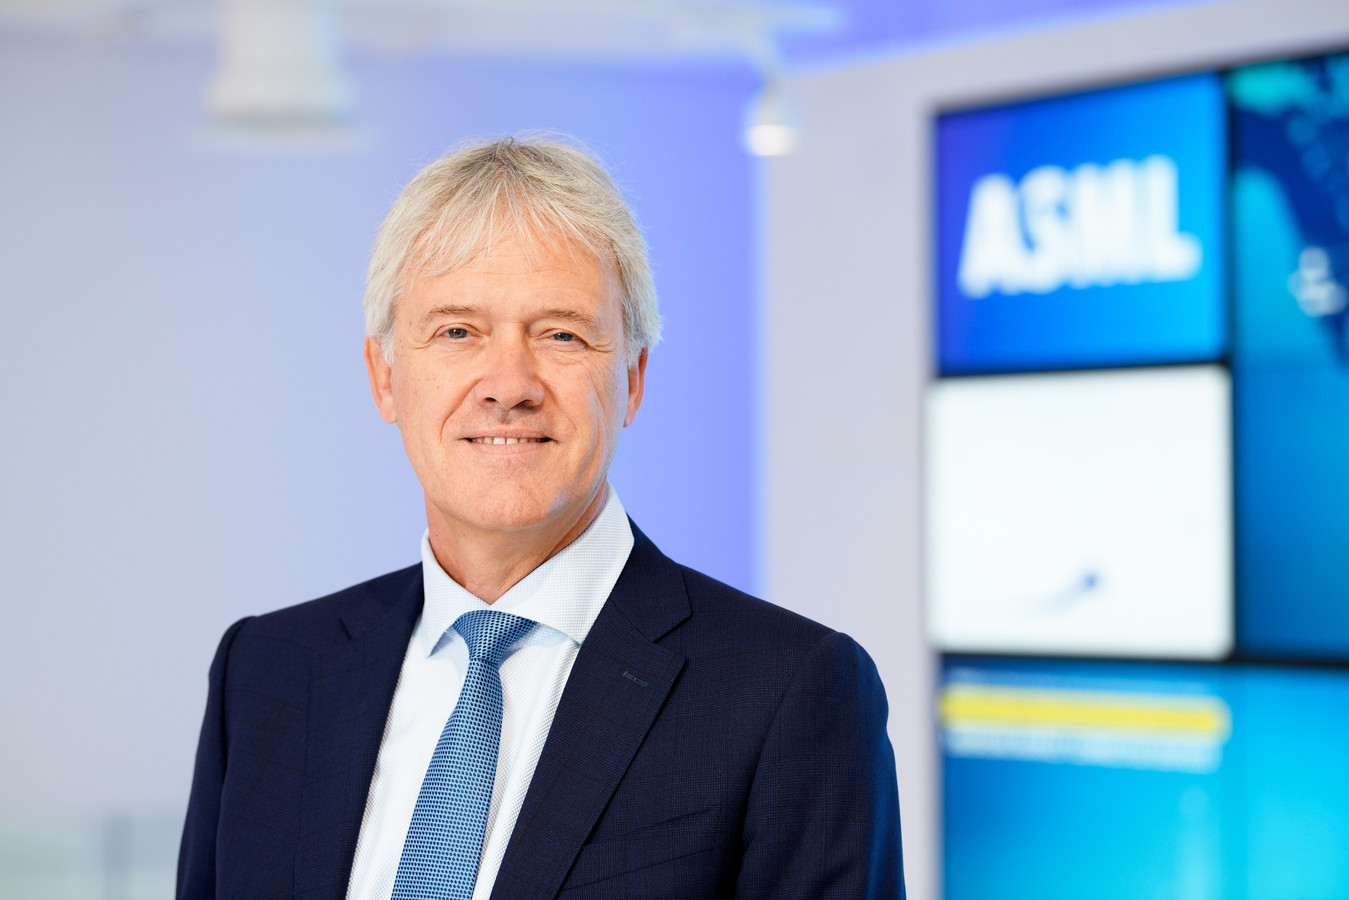 Peter Wennink, CEO, ASML